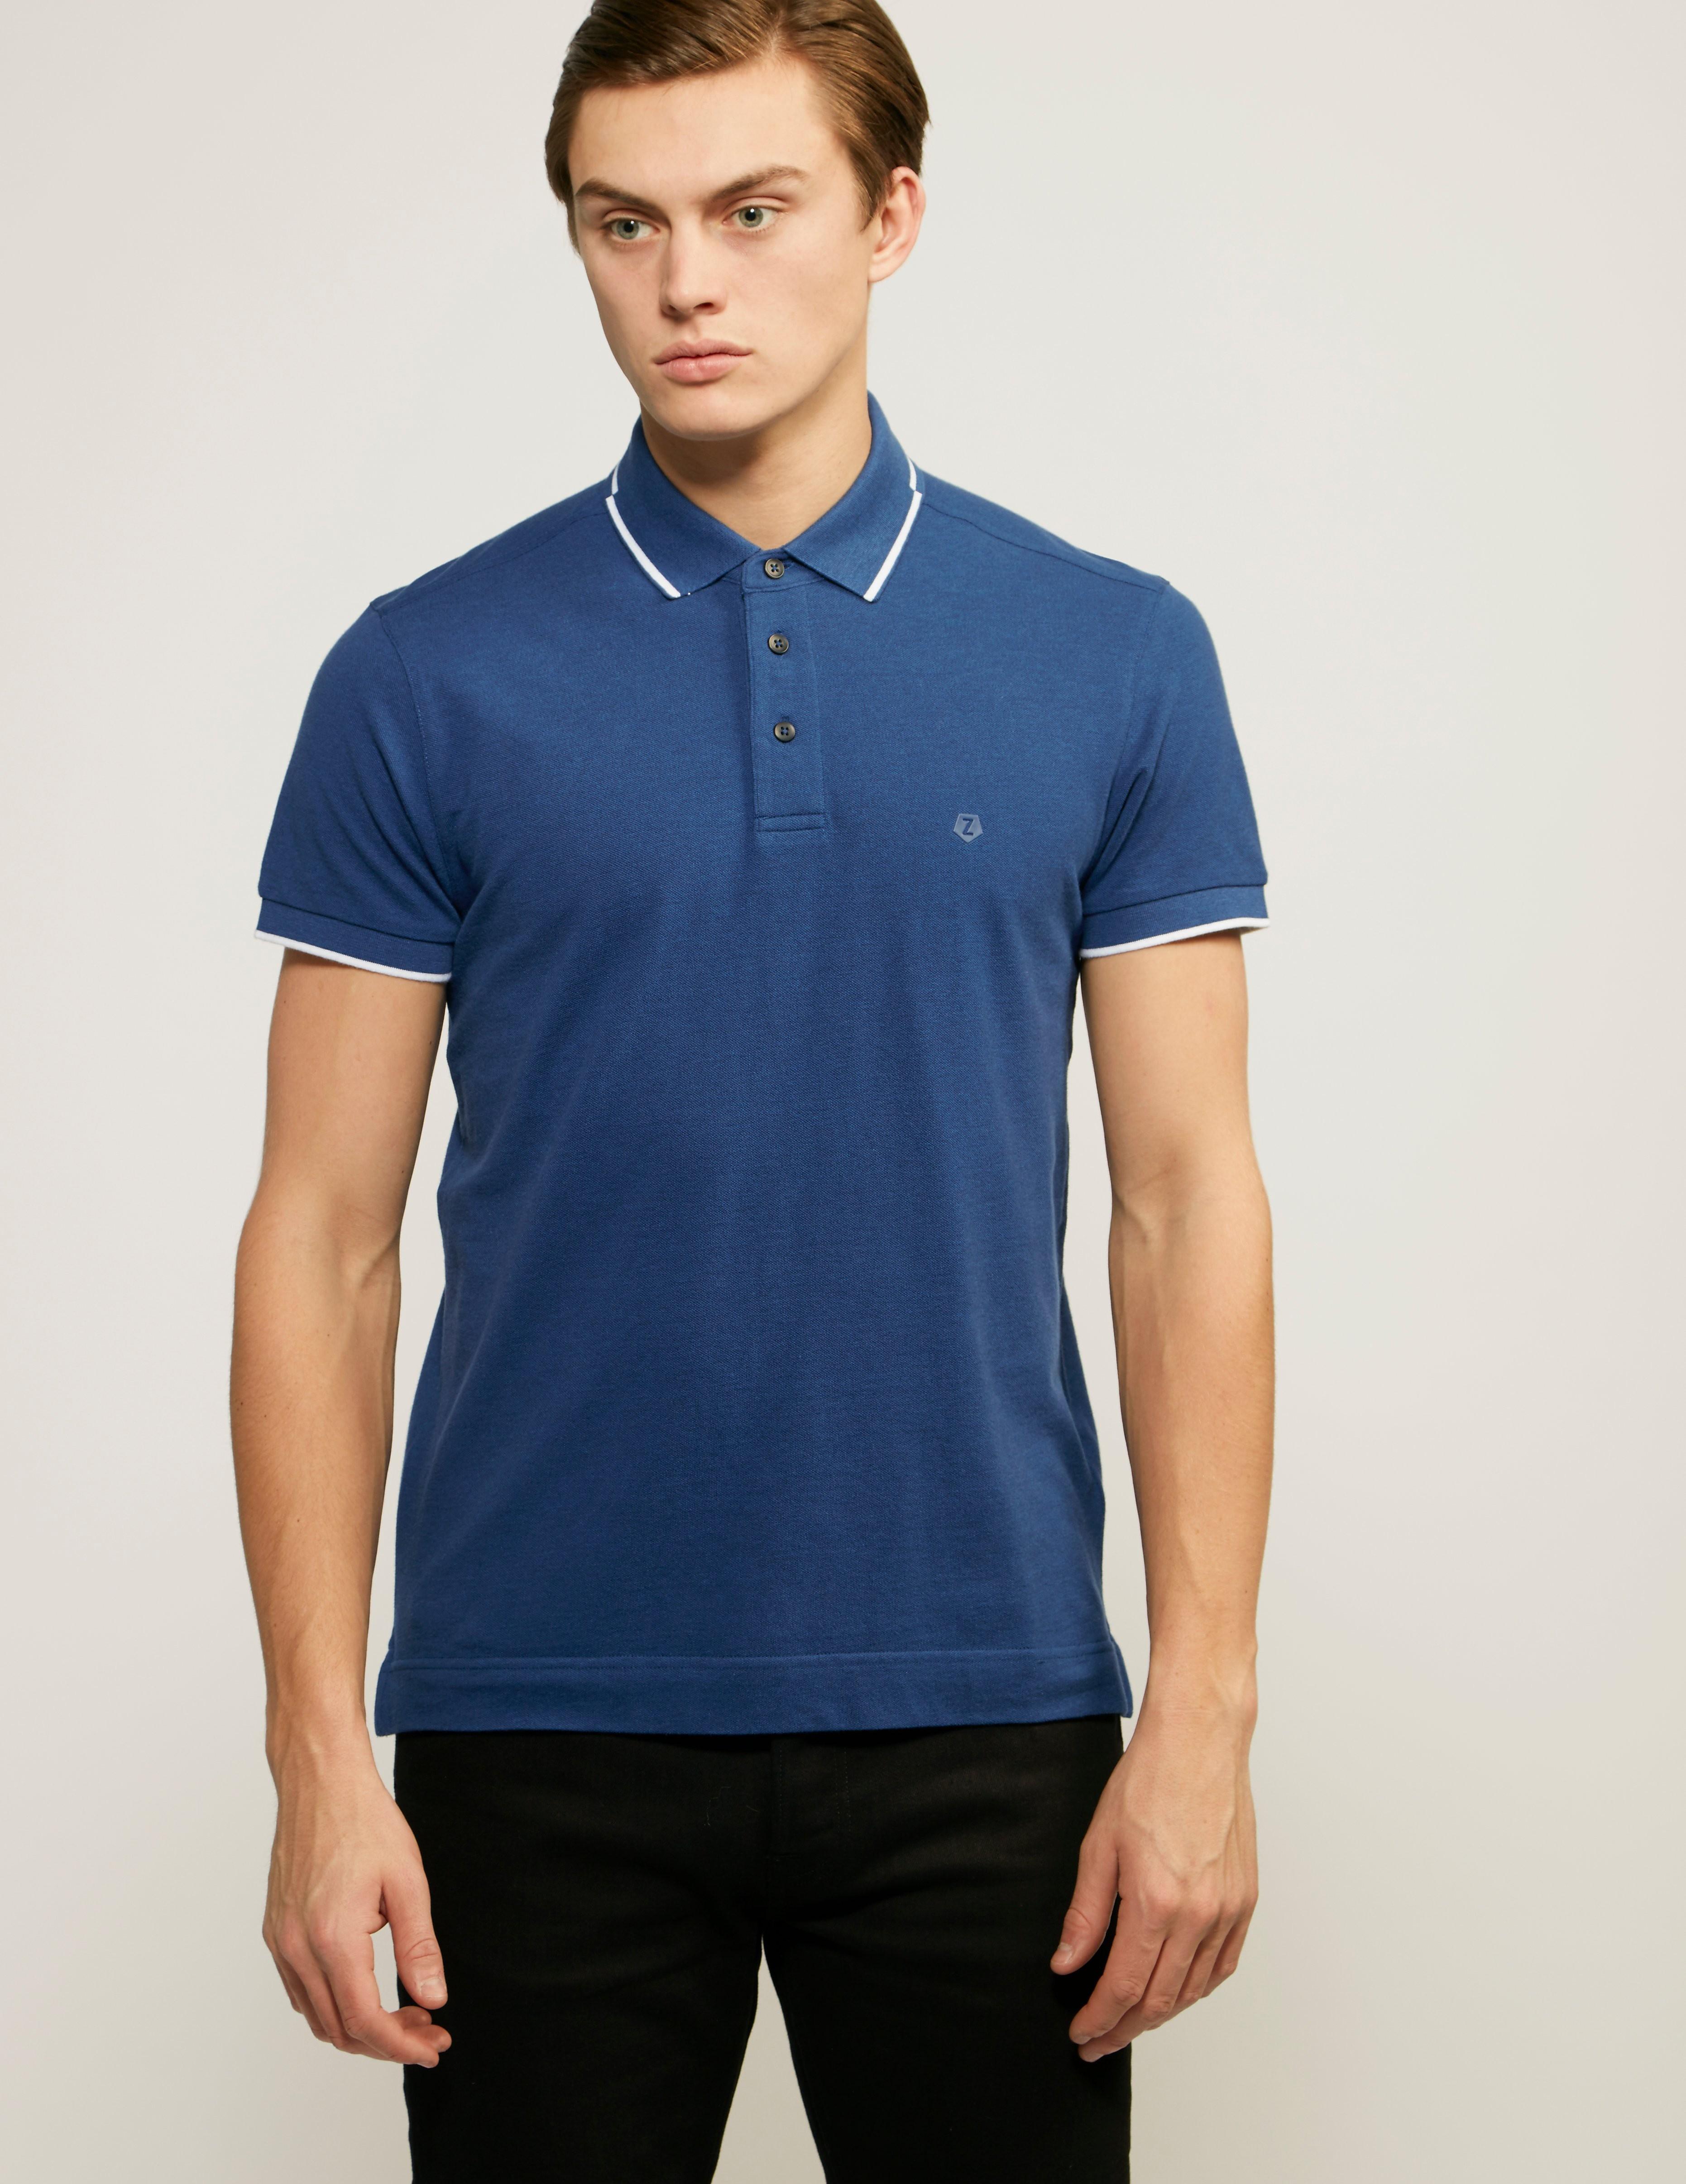 Z Zegna Basic French Polo Shirt